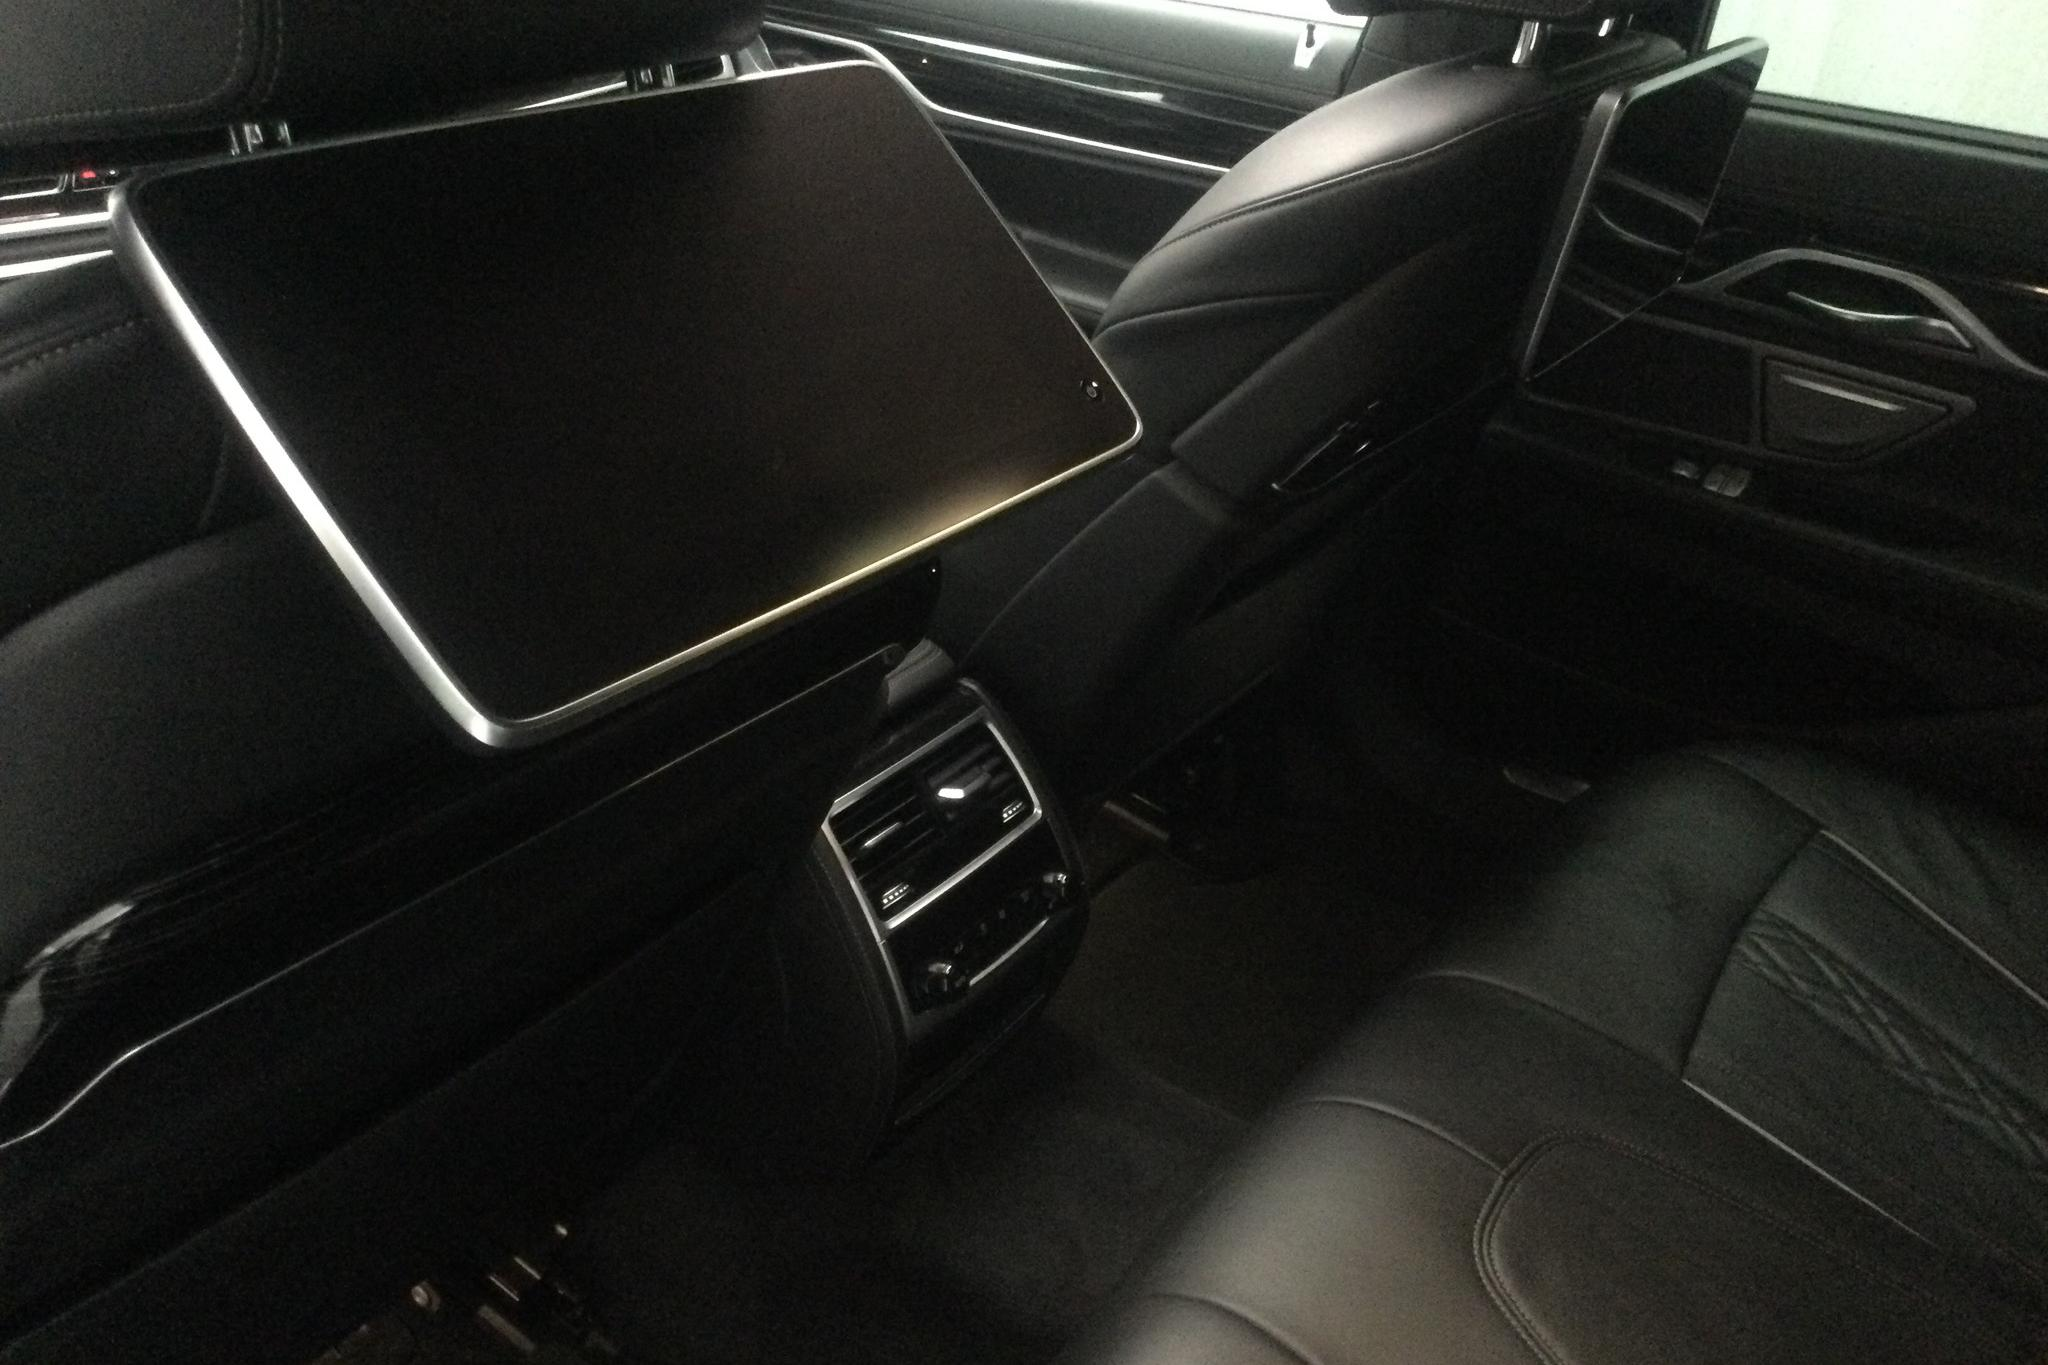 BMW 740e iPerformance Sedan, G11 (326hk) - 3 520 mil - Automat - grå - 2017